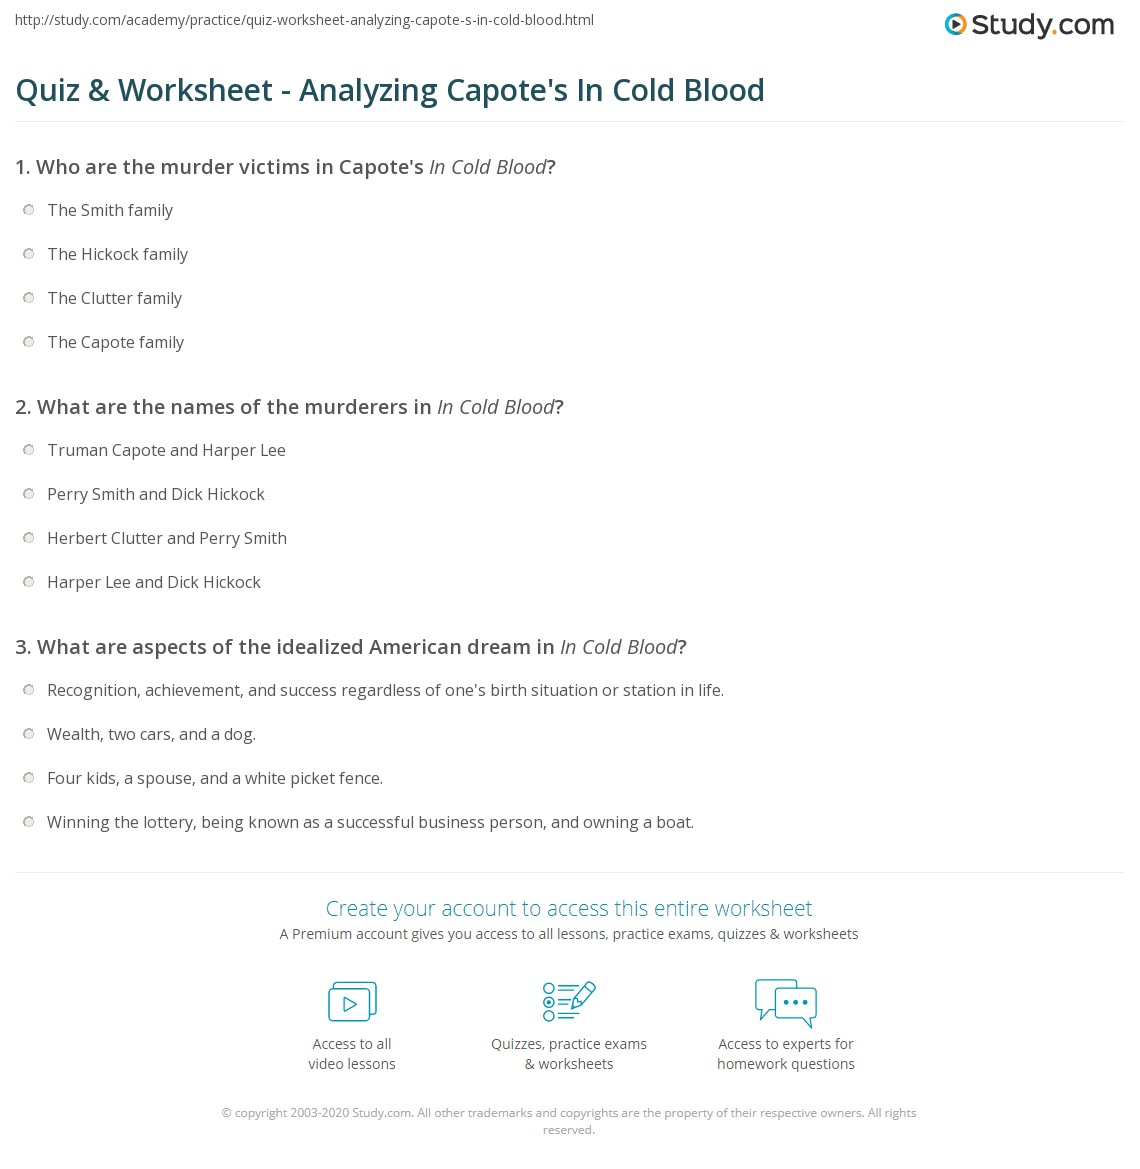 quiz worksheet analyzing capote s in cold blood com print capote s in cold blood themes analysis worksheet